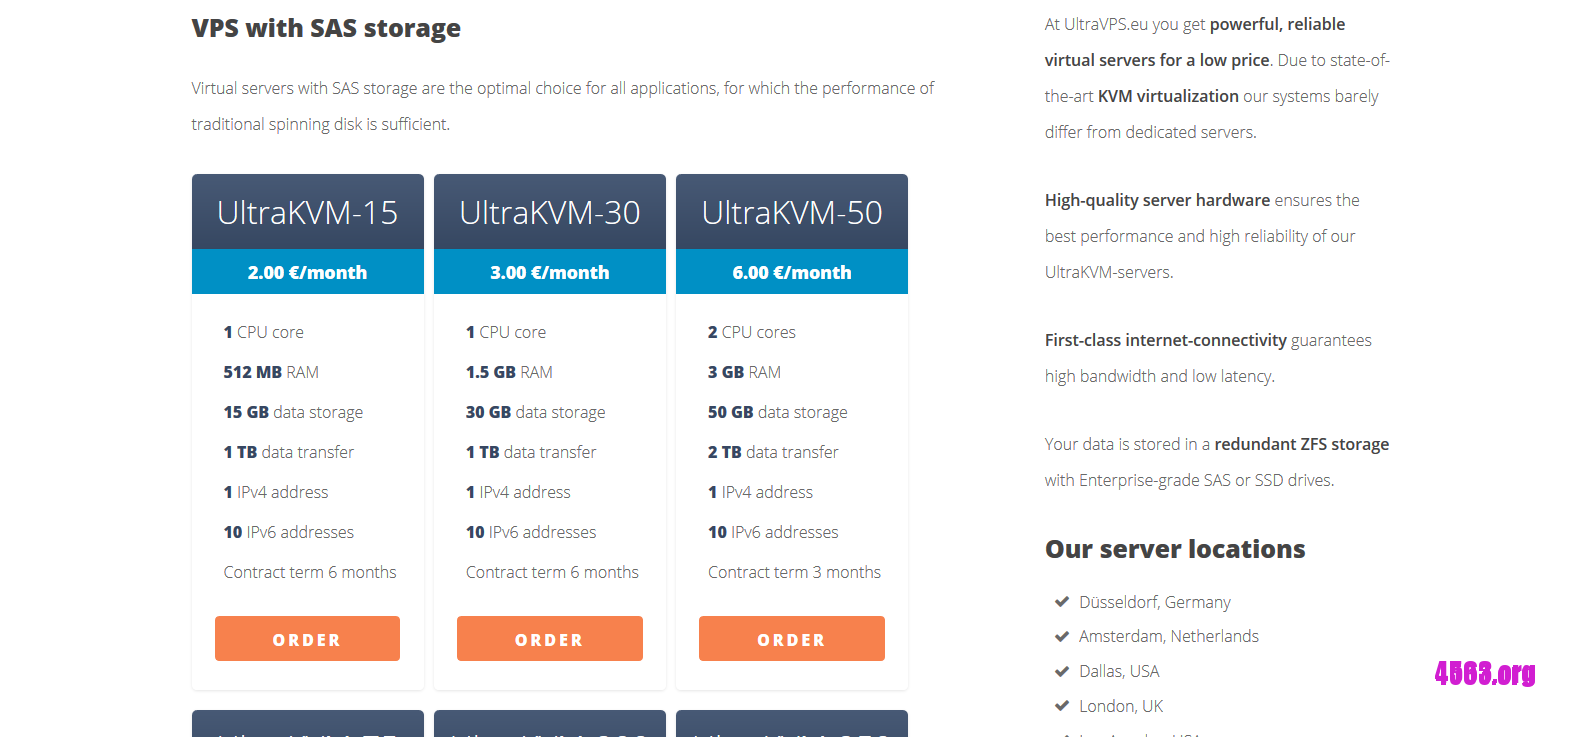 UltraVPS.eu立陶宛VPS@1核,512內存,15G硬盤,1TB流量@1.68欧元